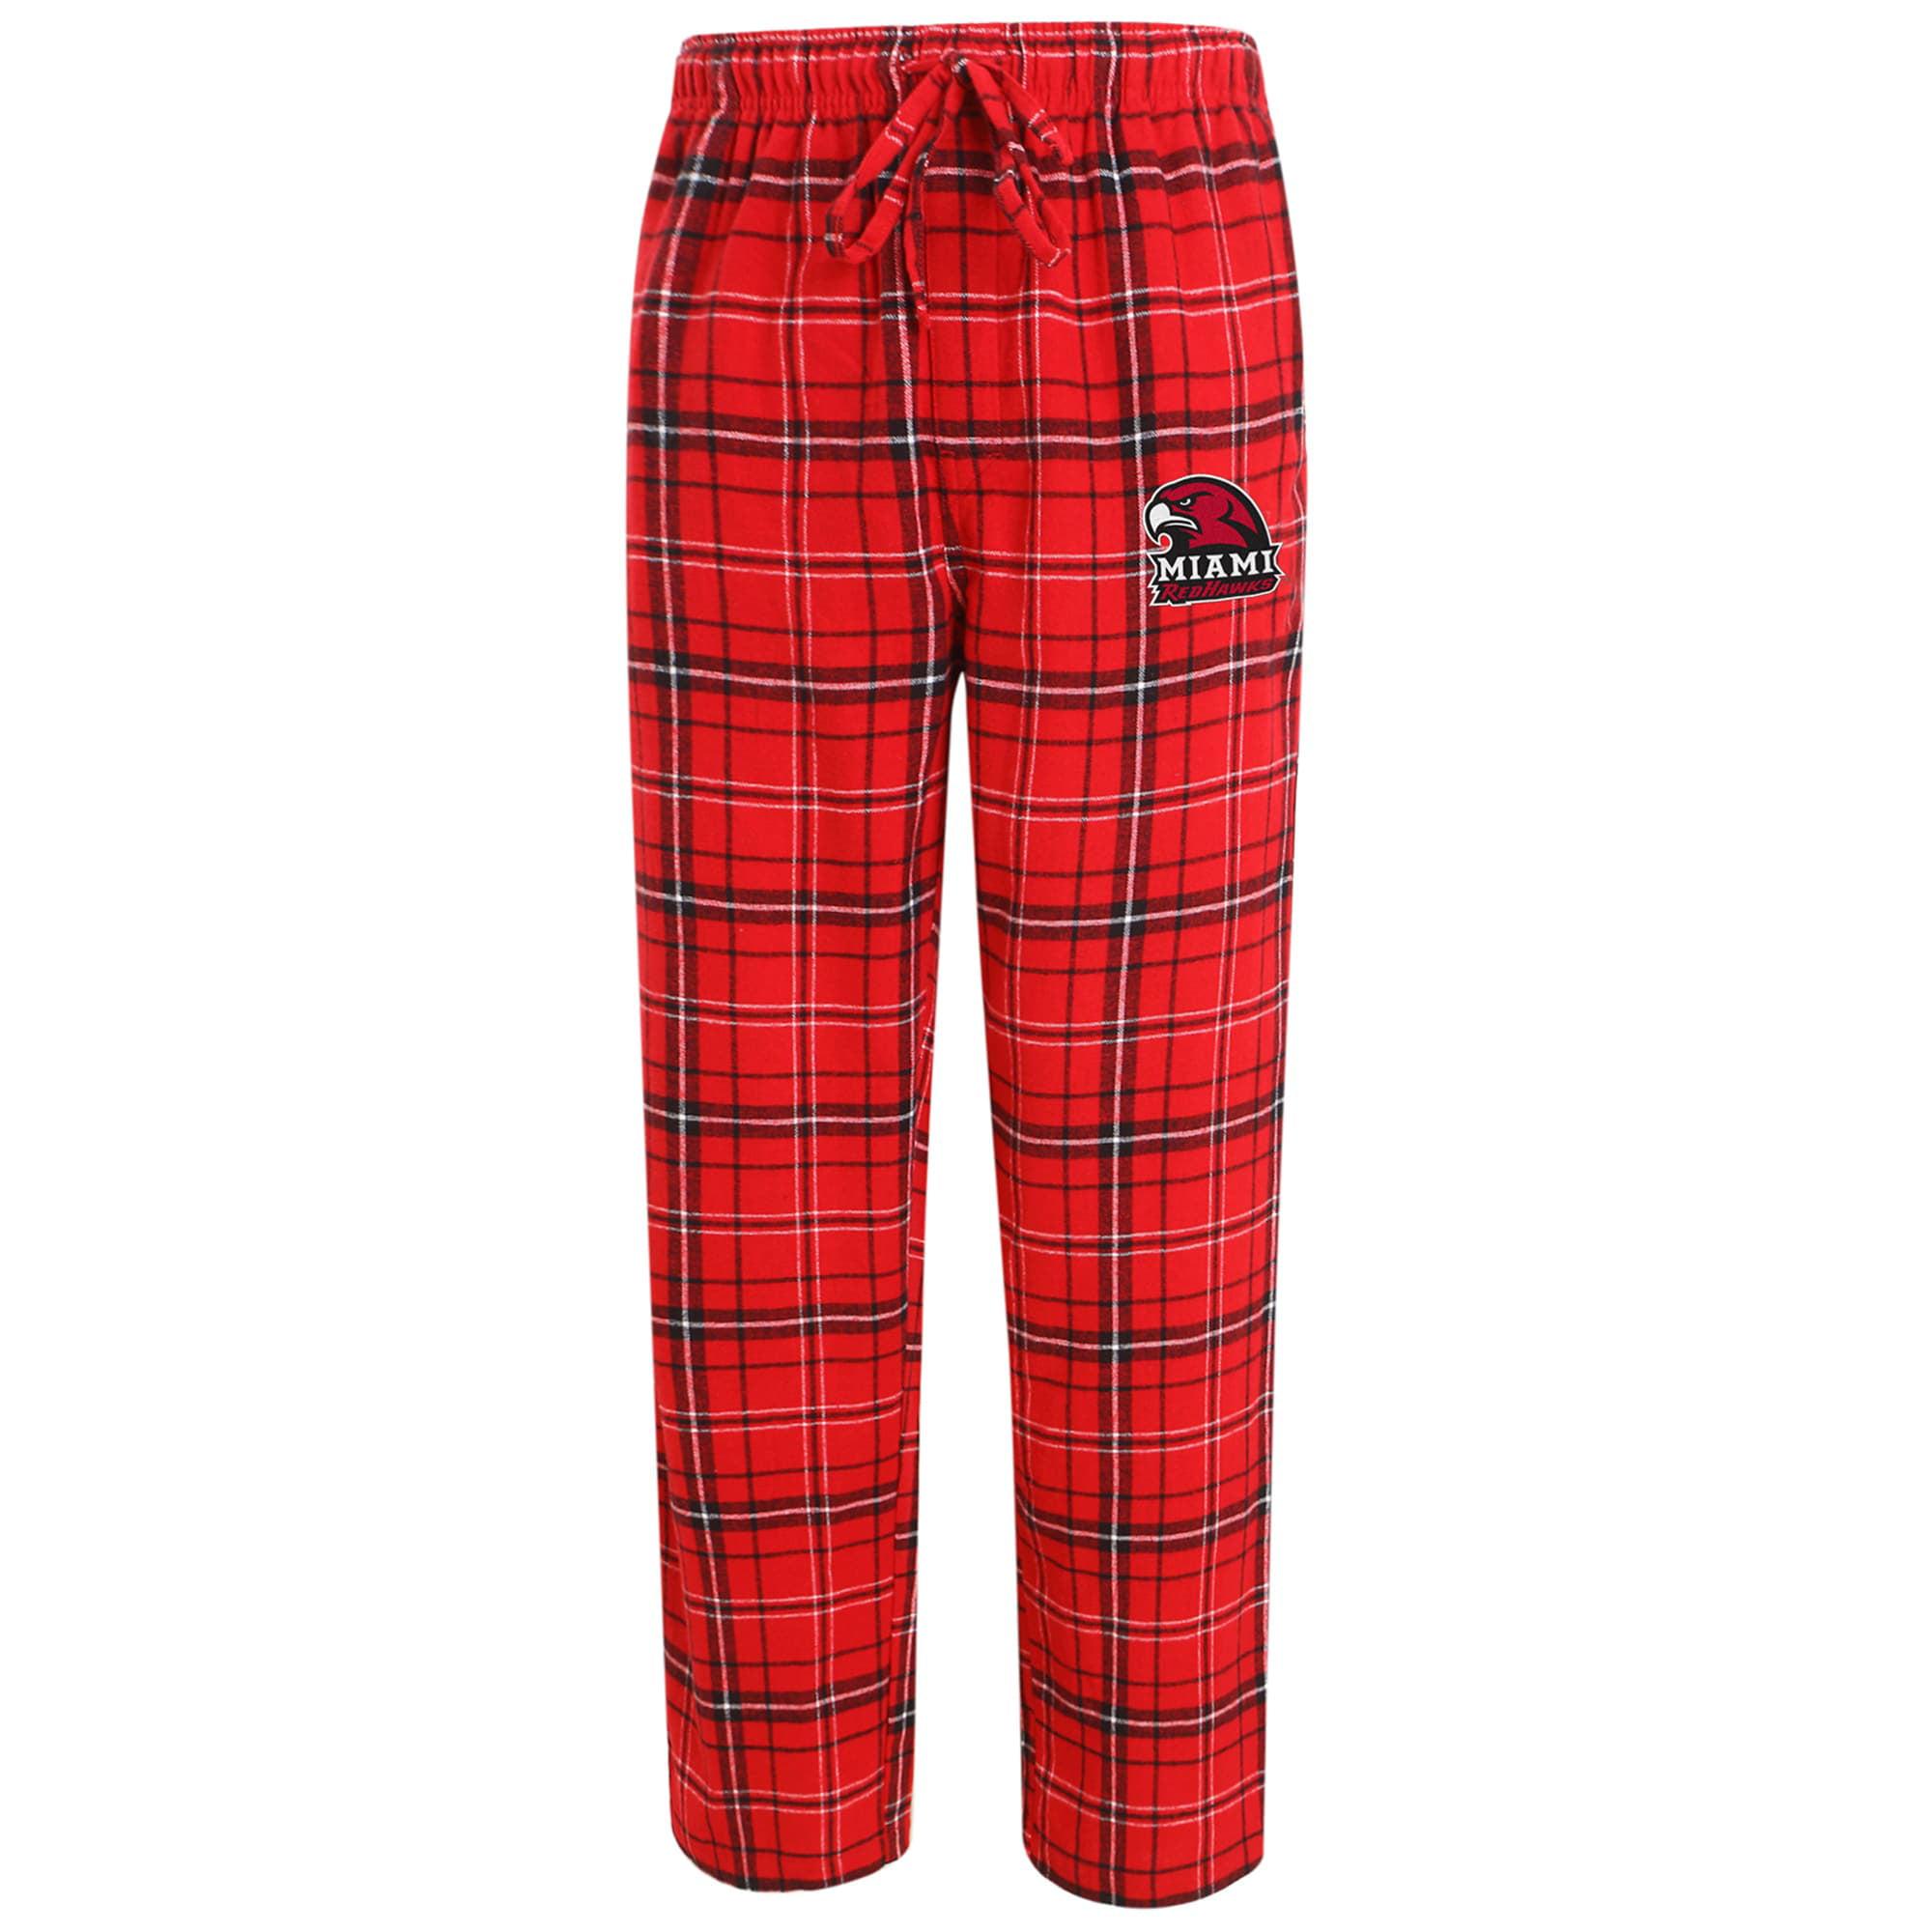 Stanford Cardinal Adult NCAA Team Pride Flannel Lounge Pants Team Color